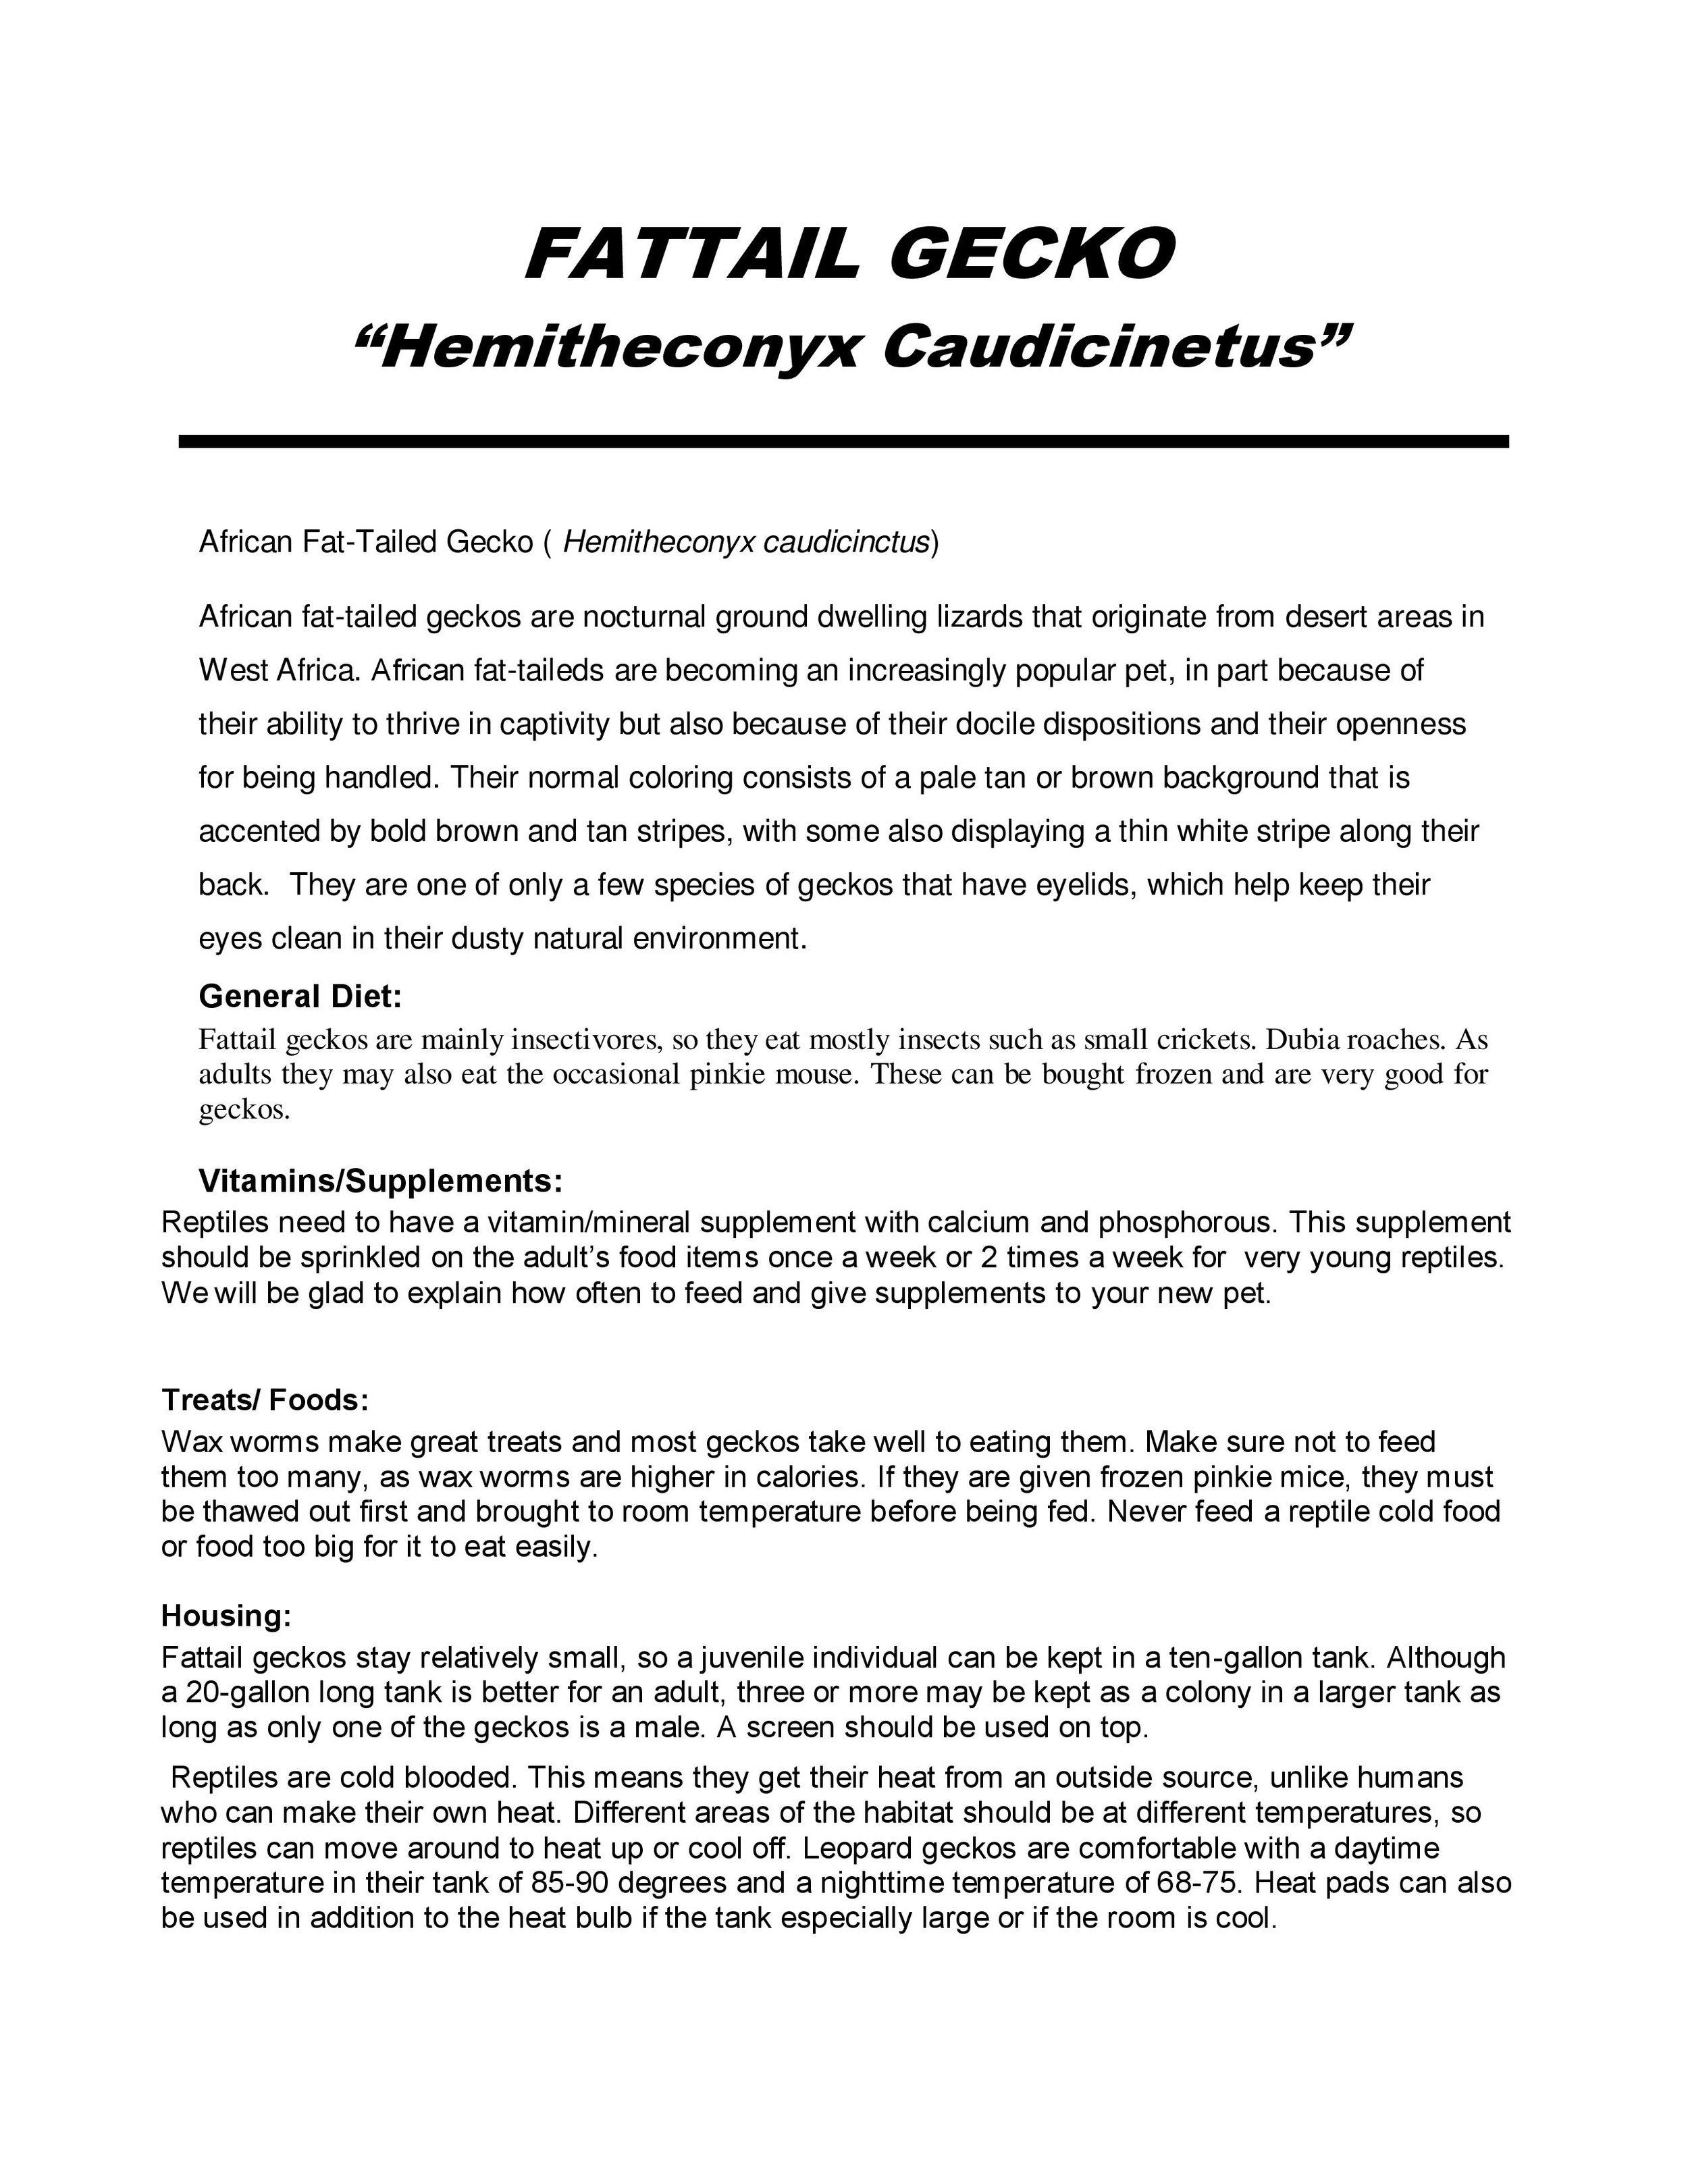 Fattail Gecko Caer Sheet pg1